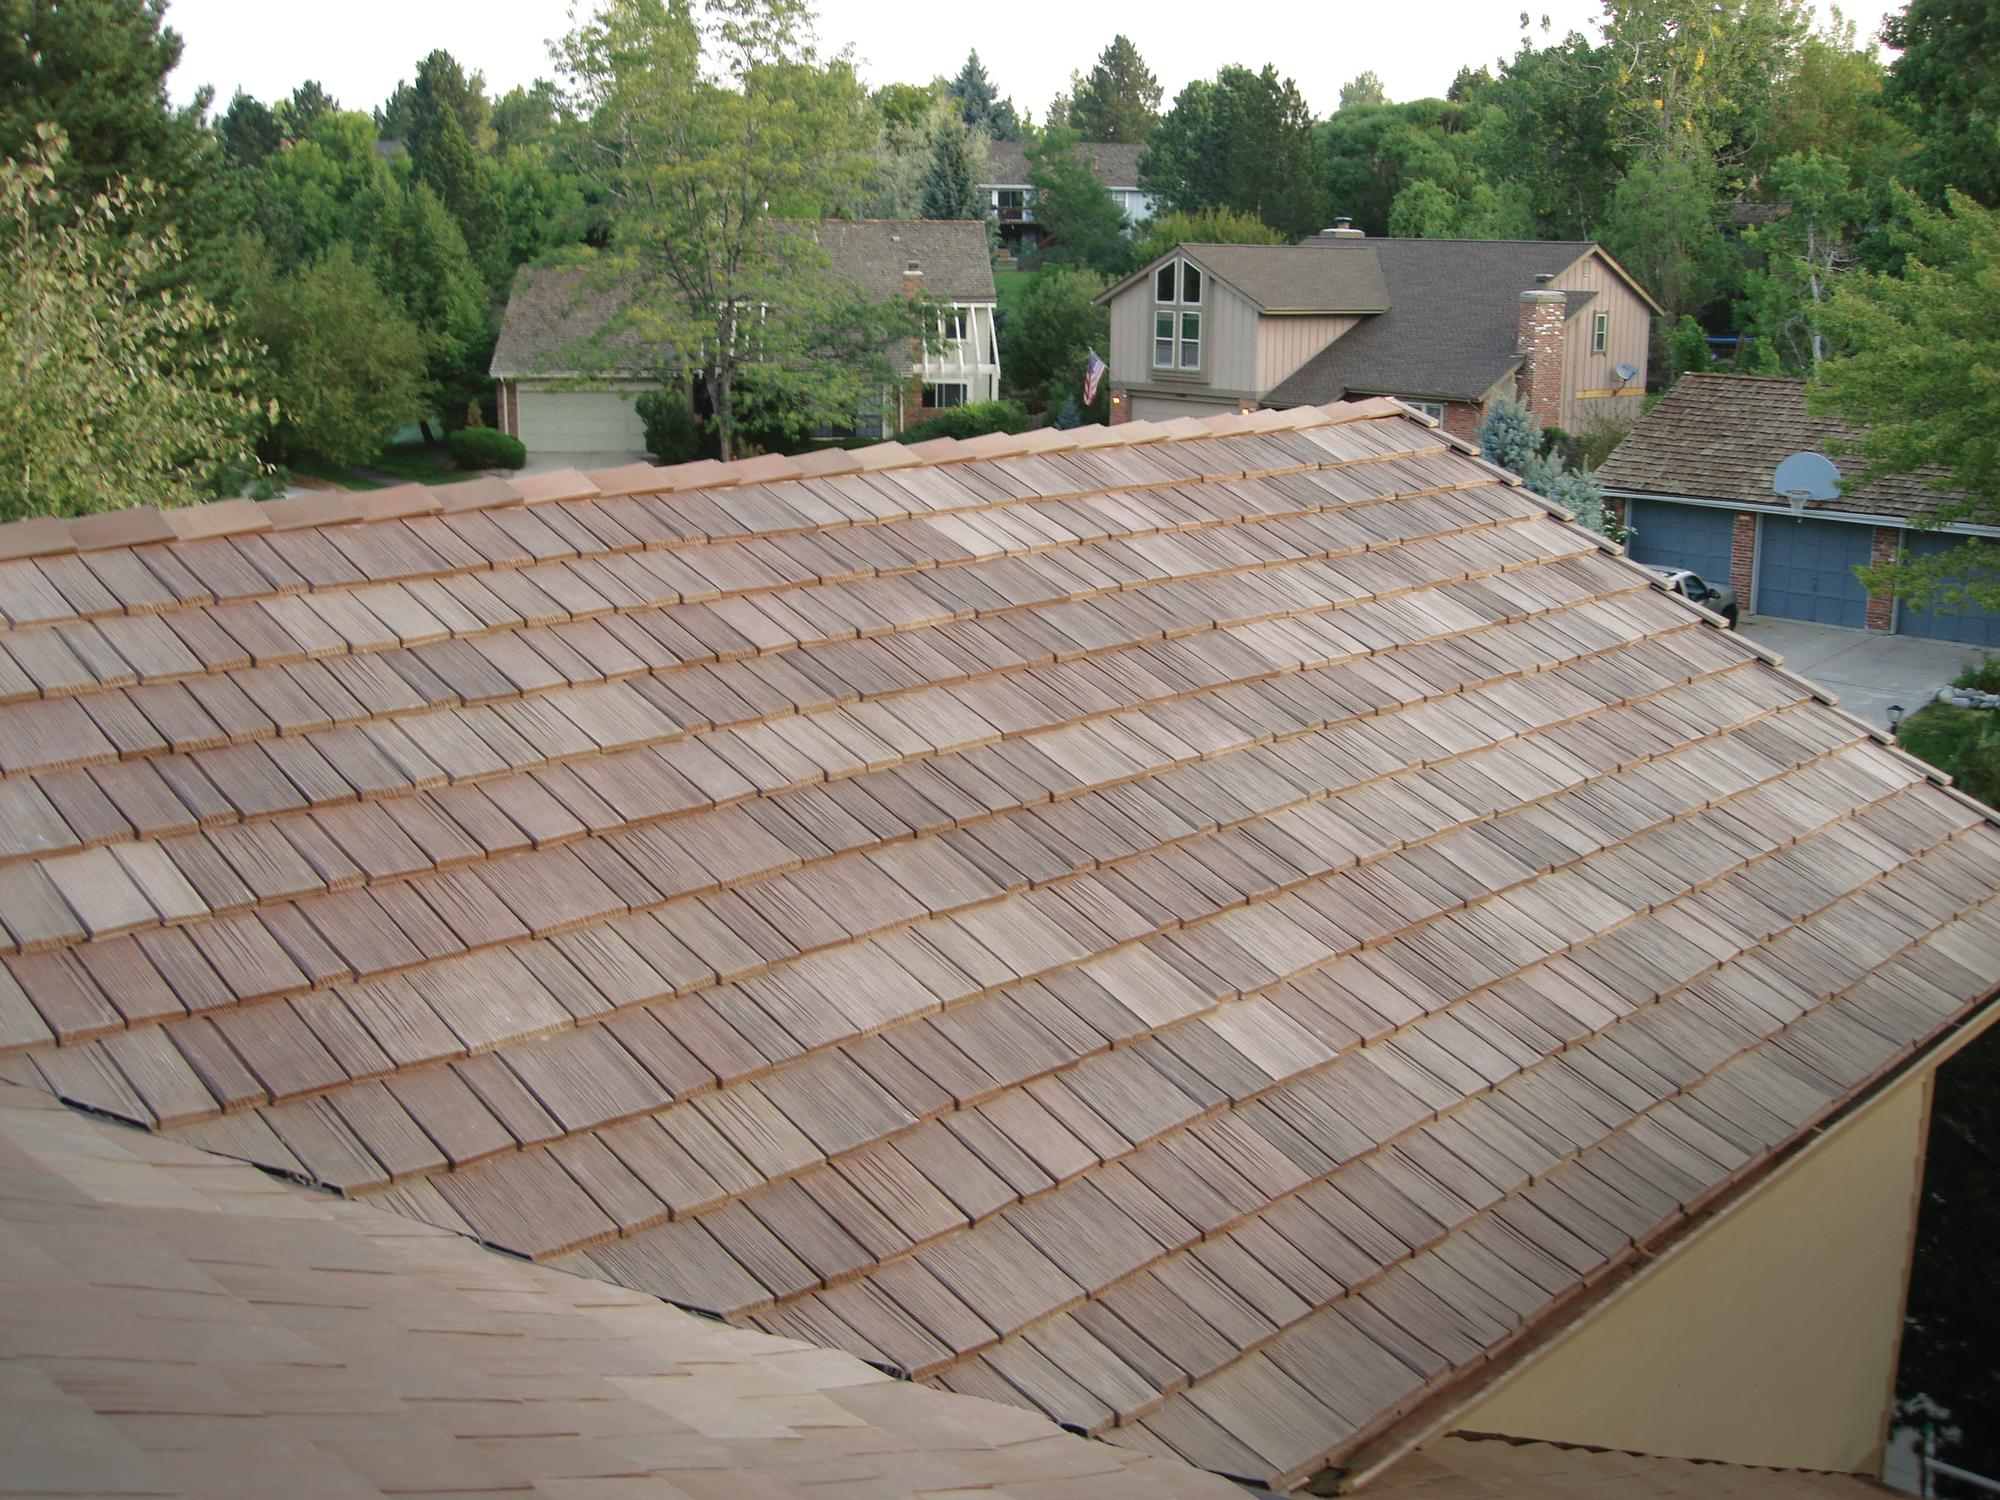 What I Like Davinci Roofscapes Bellaforte Shake